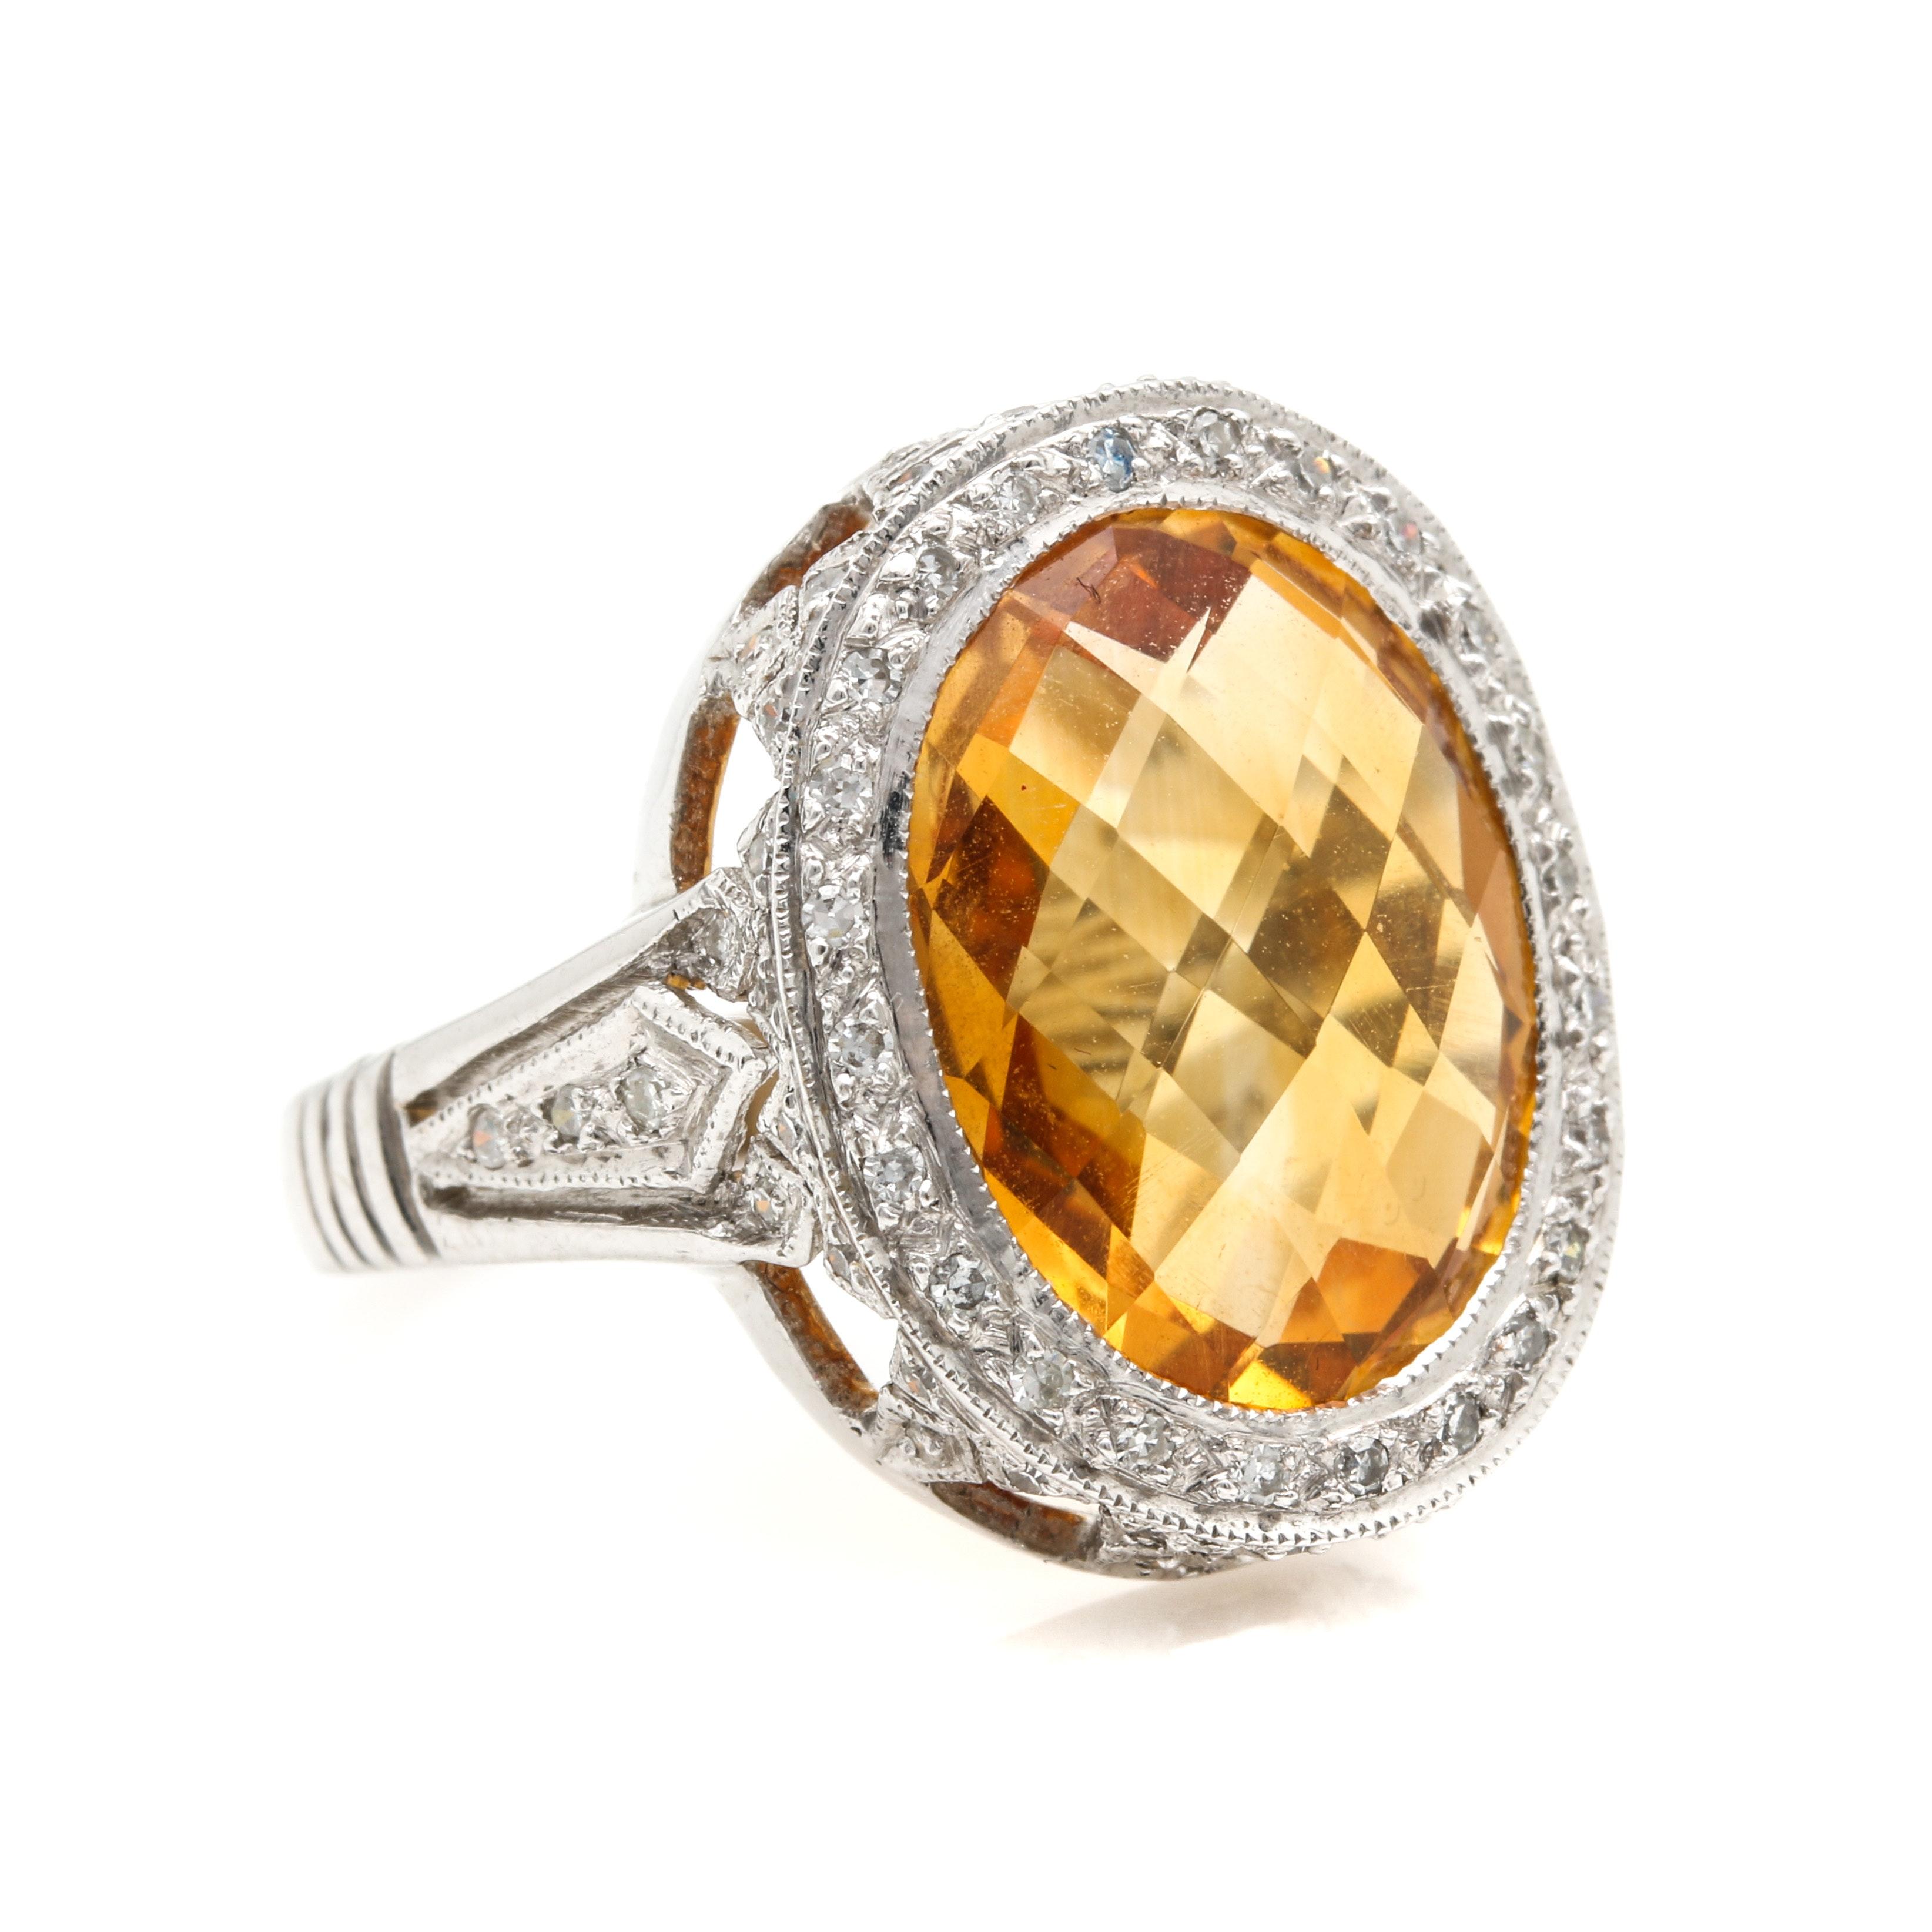 14K White Gold 6.40 CT Citrine and Diamond Ring